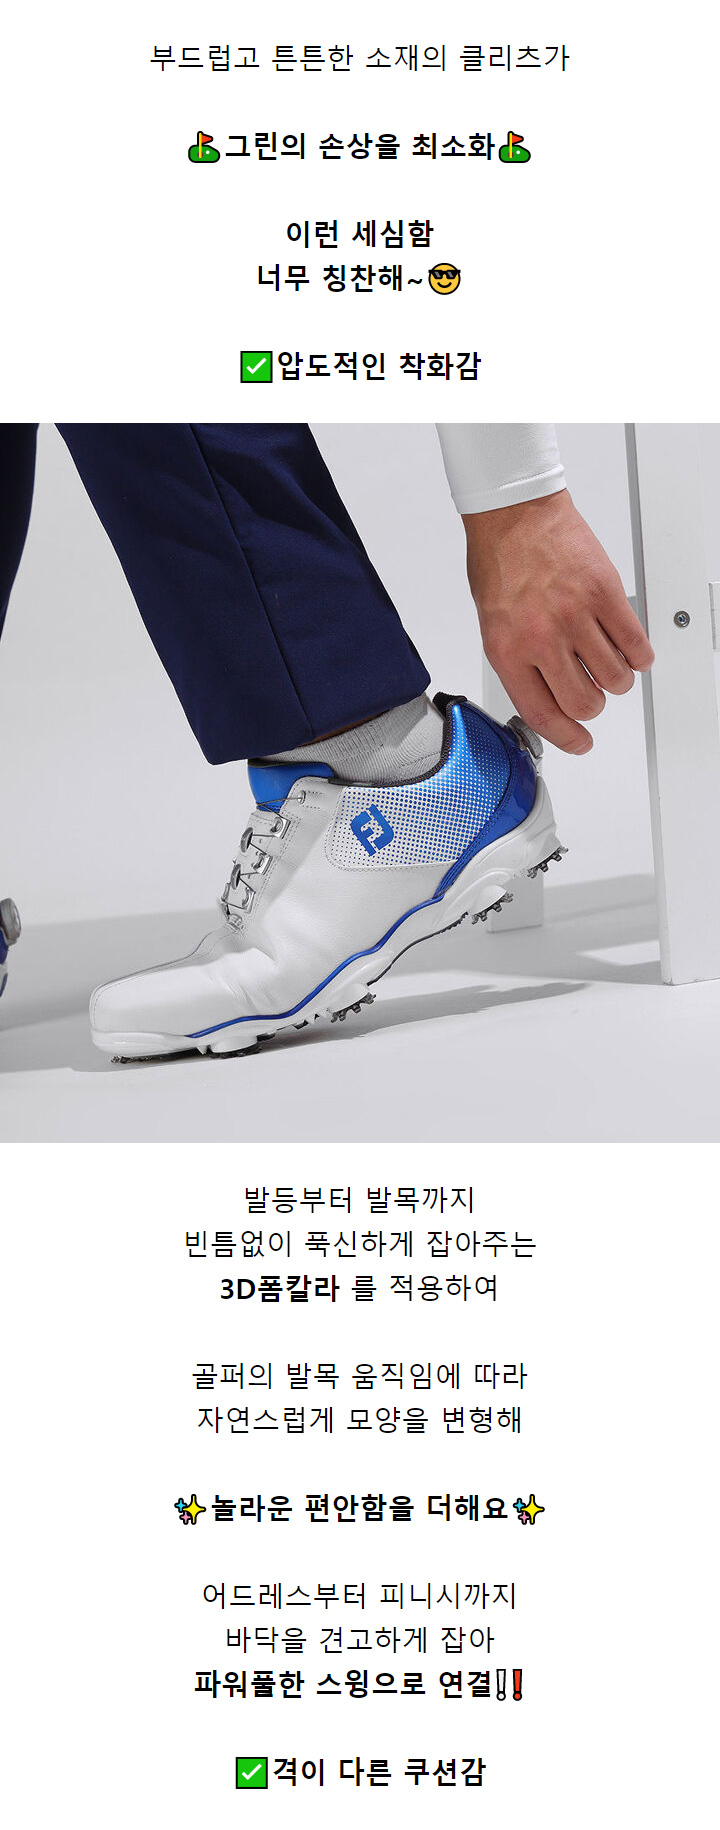 footjoy_dna_helix_boa_xw_17.jpg